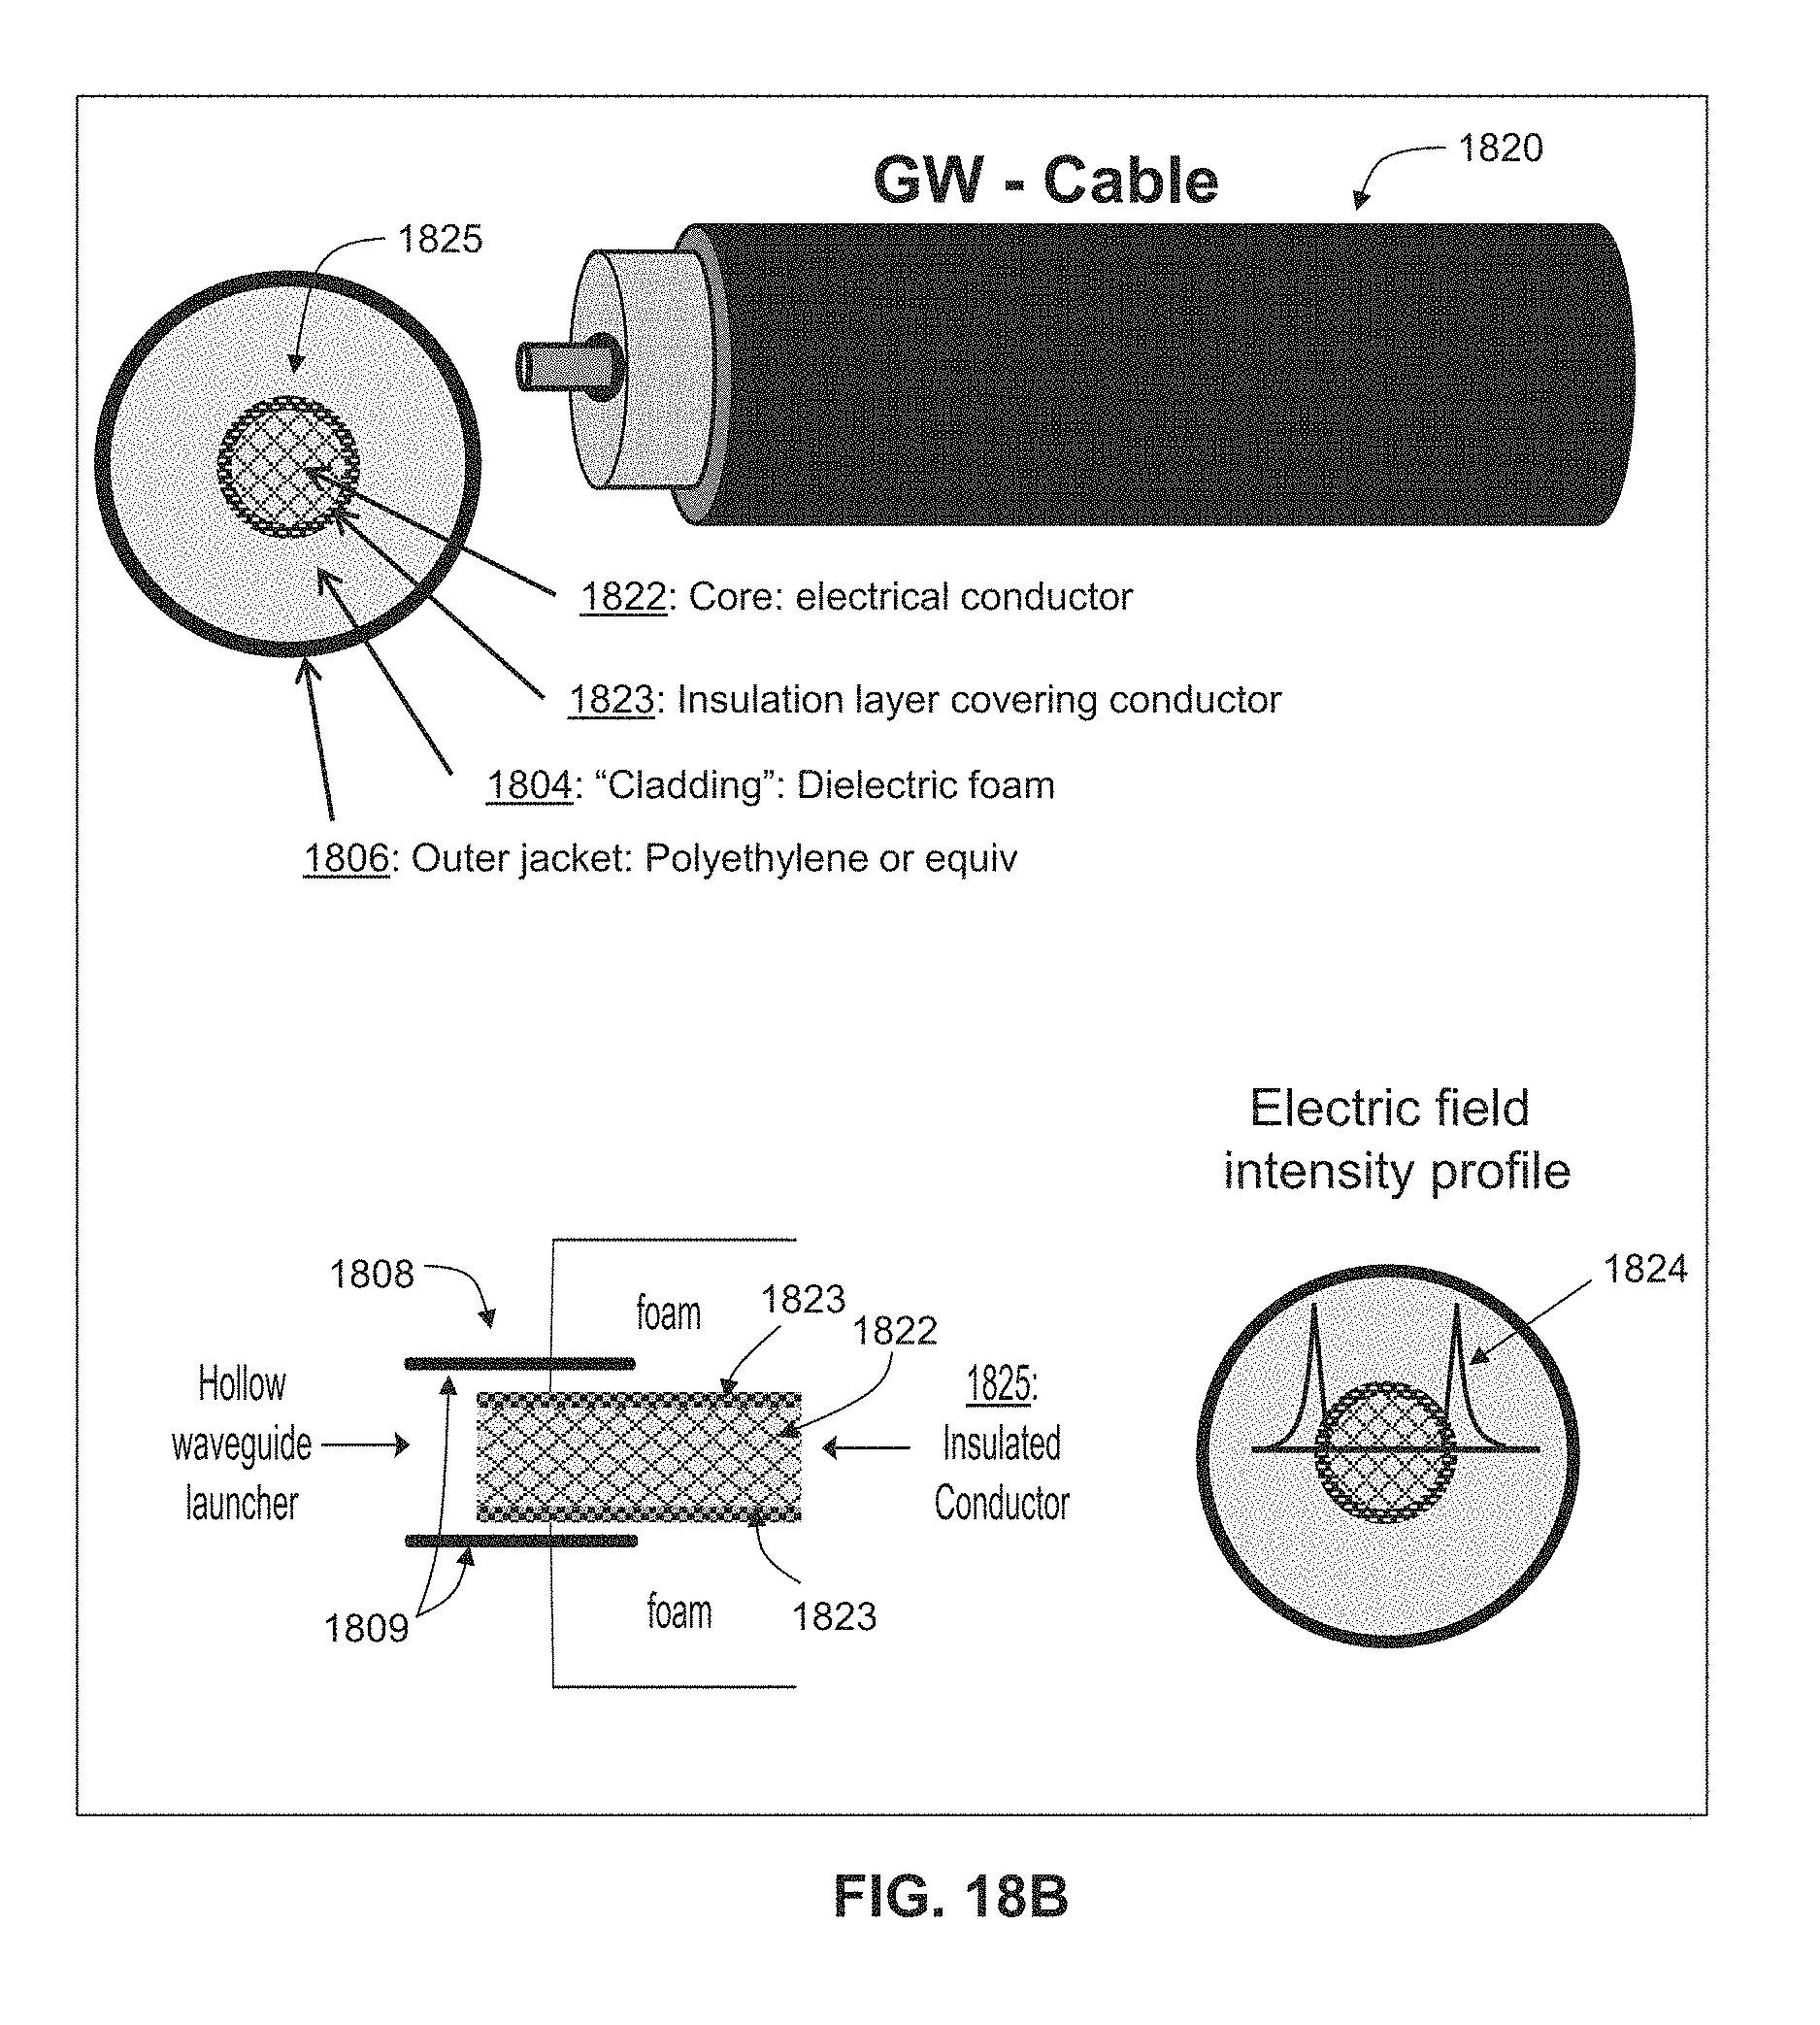 Case Ih Parts Diagram Case Ih 485 Wiring Schematic Another Blog About Wiring Diagram • Of Case Ih Parts Diagram